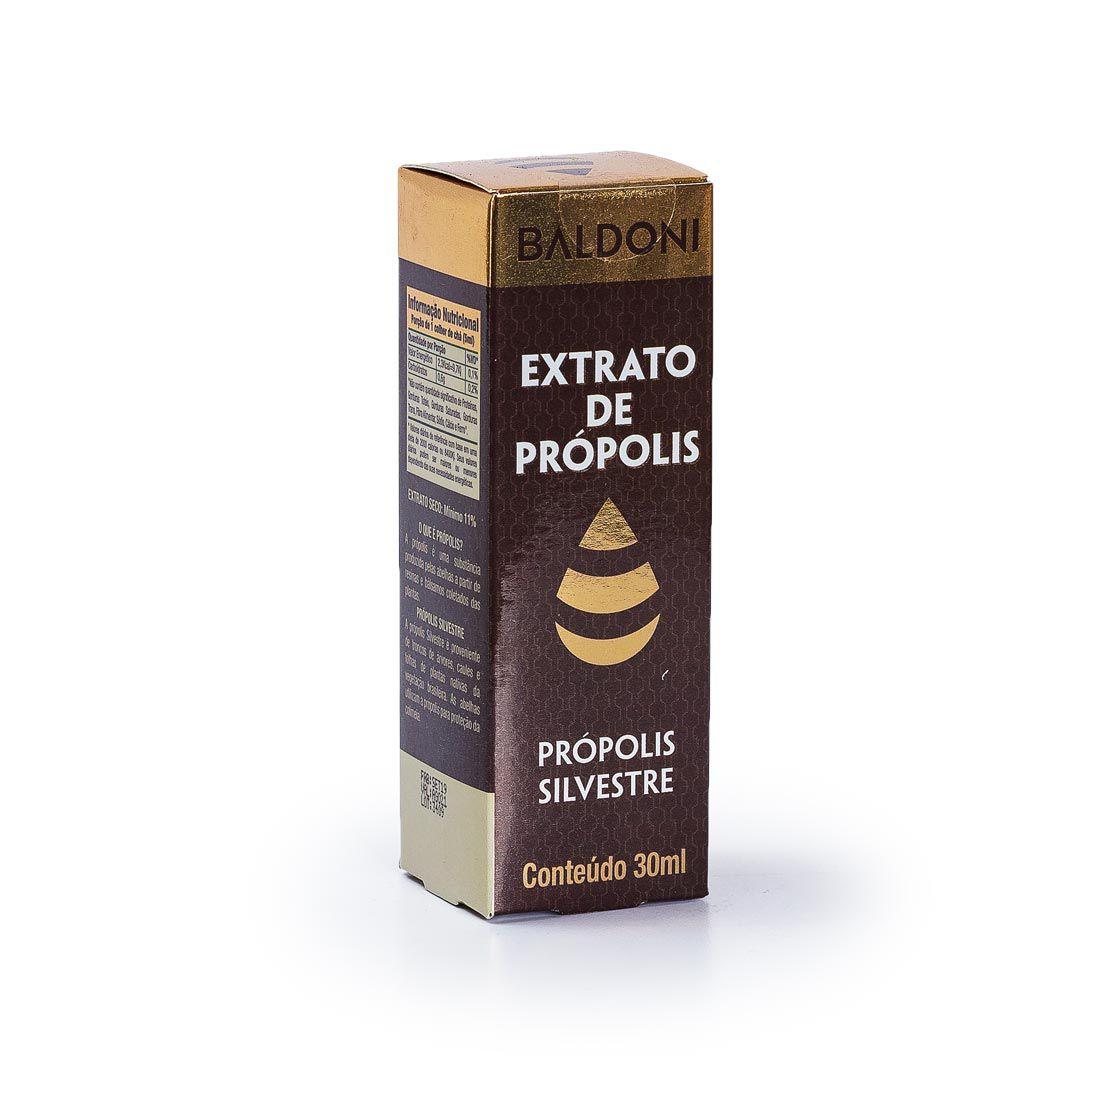 Extrato de própolis silvestre 11% 30ML - Baldoni